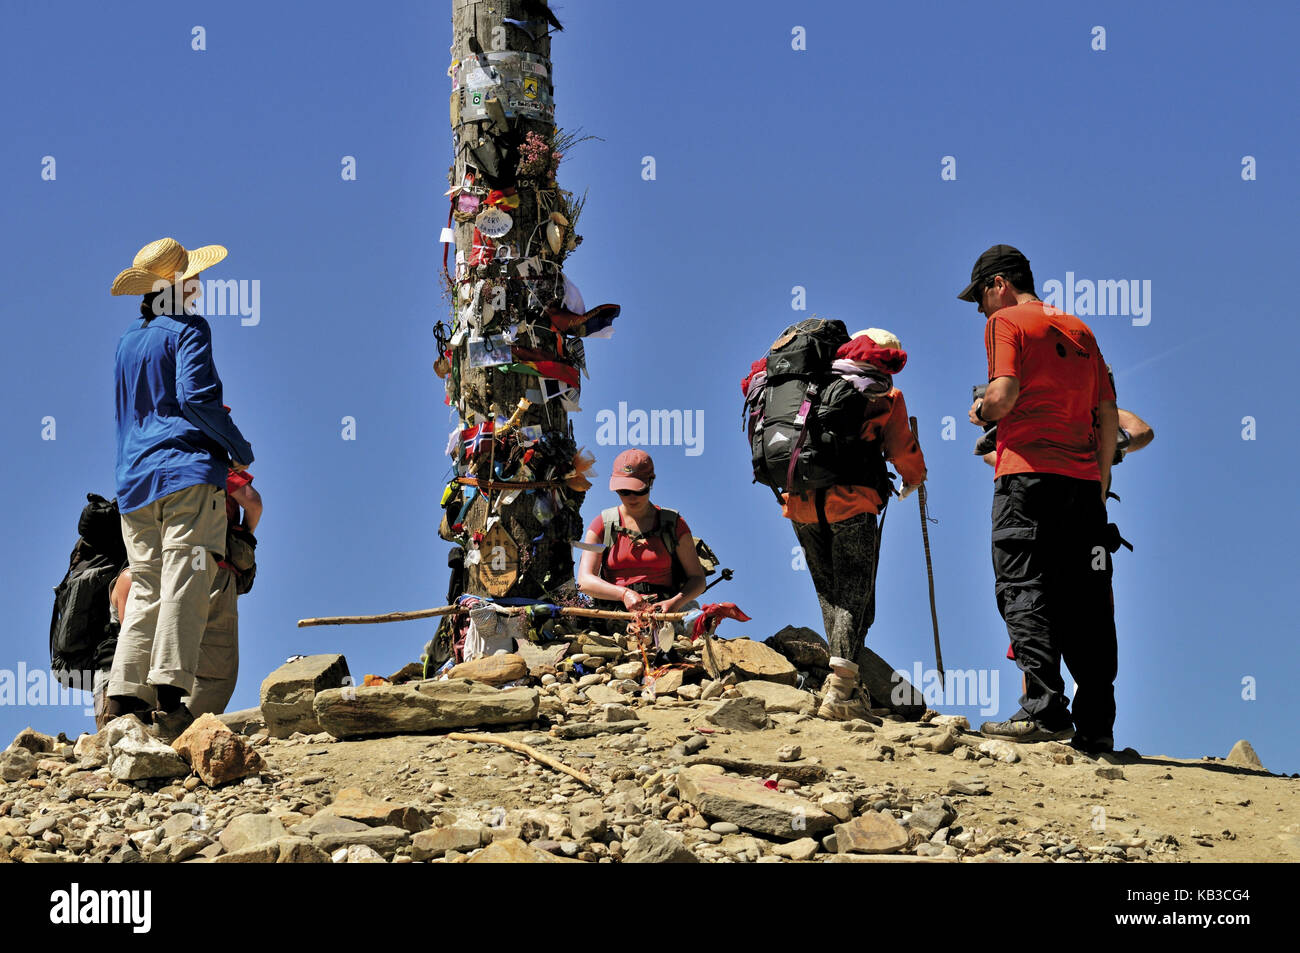 Spain, Way of St. James, jacobean pilgrim on the iron cross of Monte Irago, - Stock Image